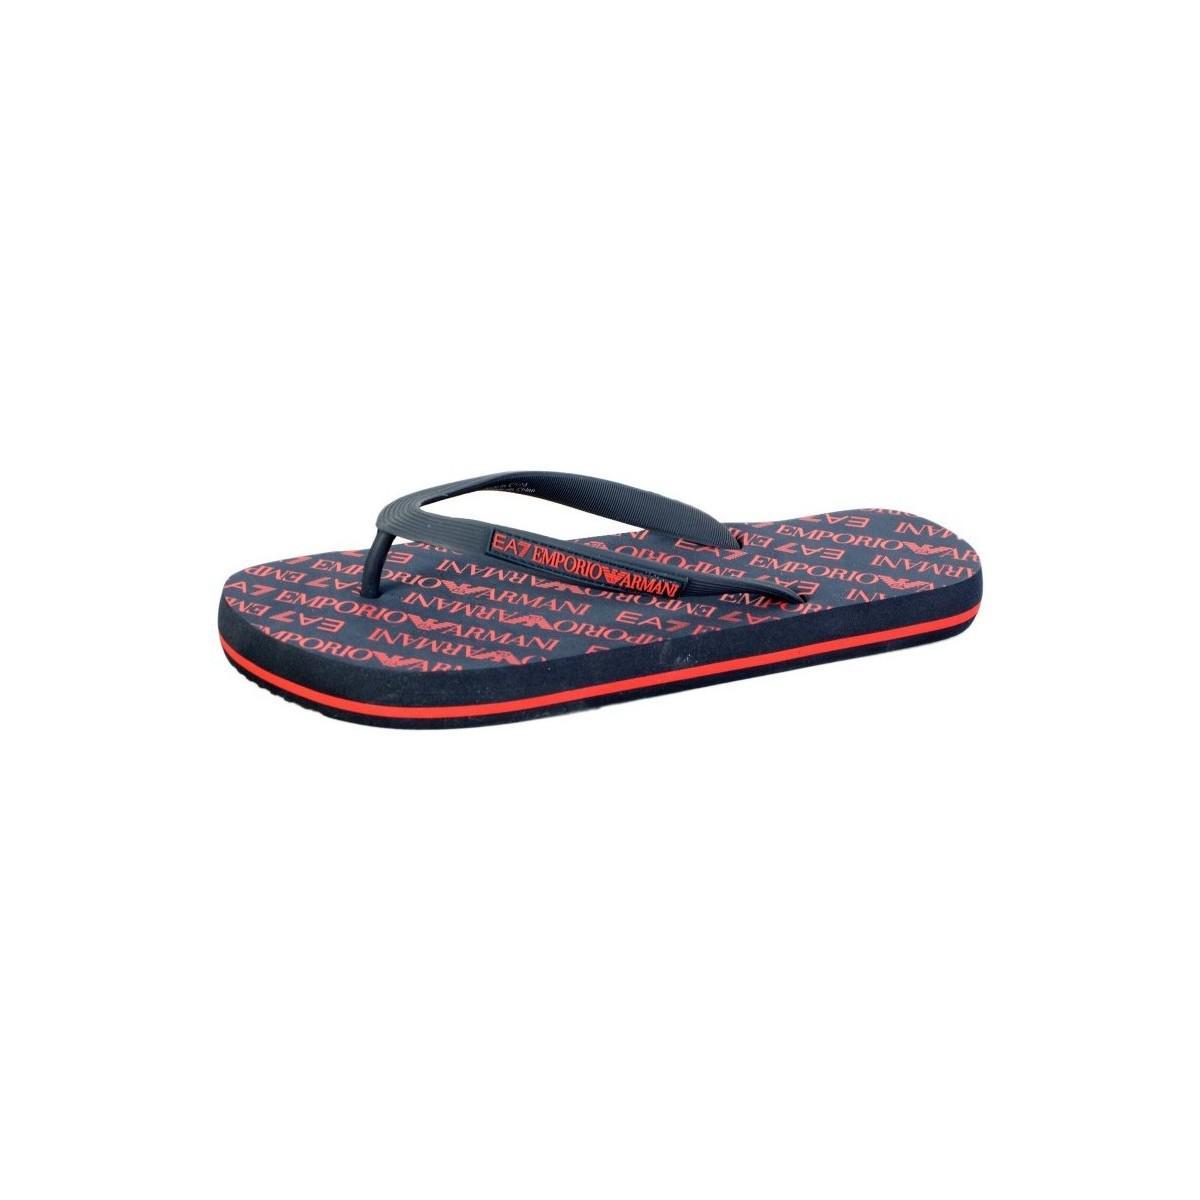 d82f8152b Ea7 Flip Flops 905010 Cc295 02836 Men s Flip Flops   Sandals (shoes ...